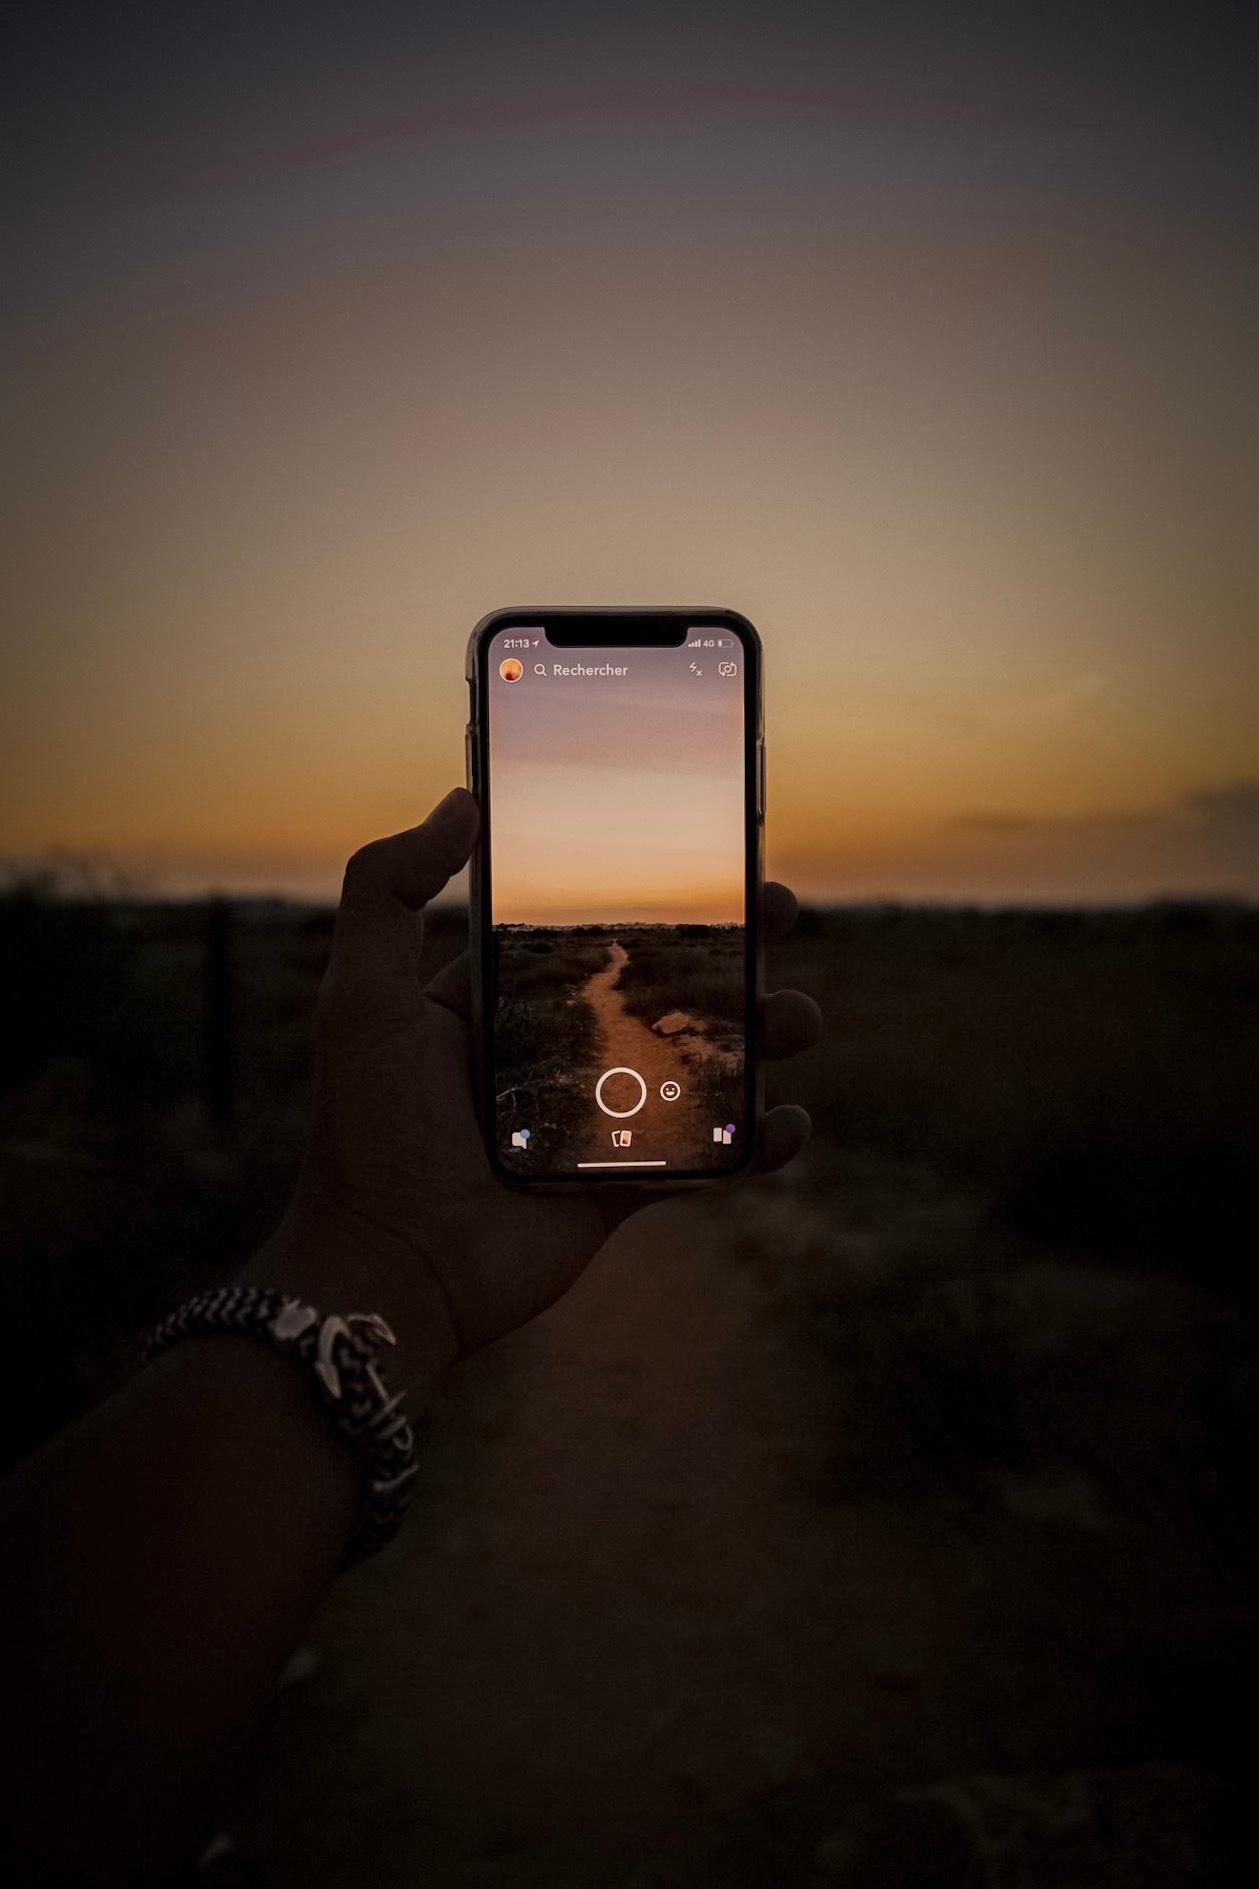 Through the phone by Jah Mz